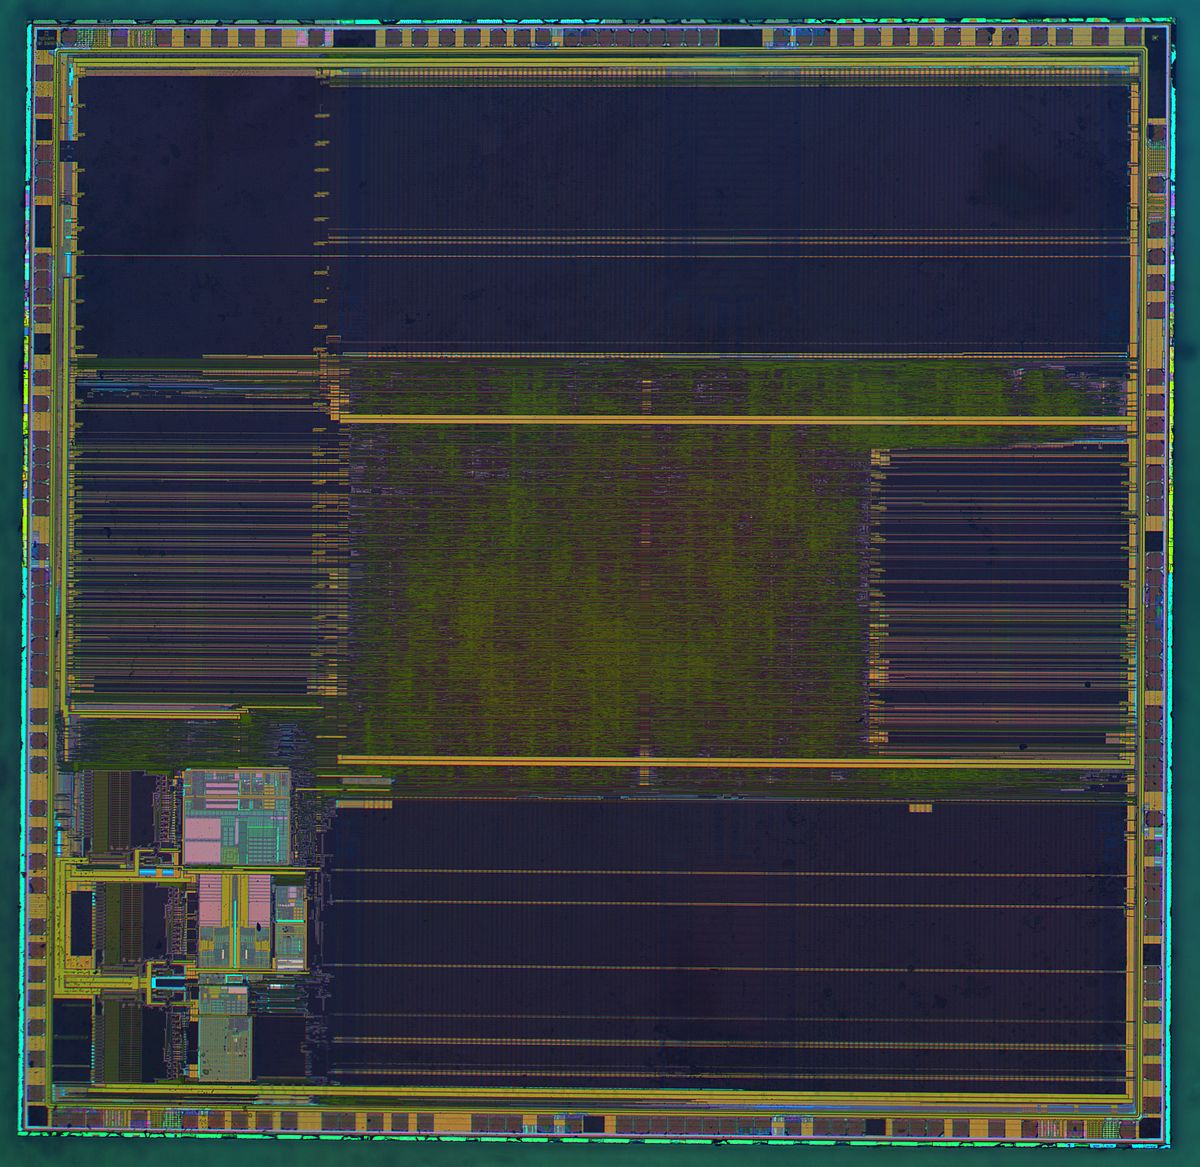 STM32 - Wikipedia